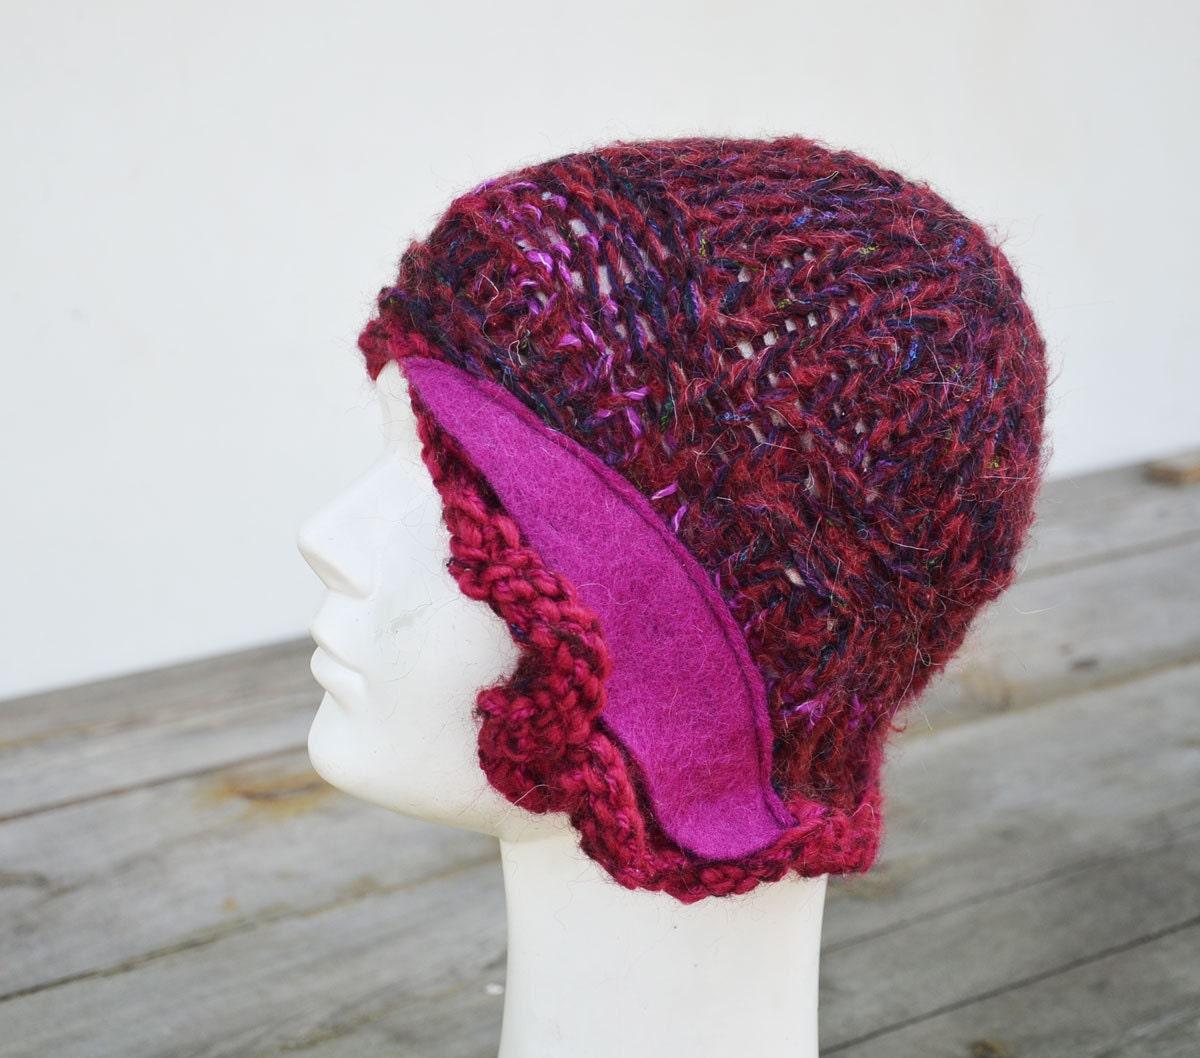 boho hat retro winter knit hat fuchsia purple magenta laca. Black Bedroom Furniture Sets. Home Design Ideas